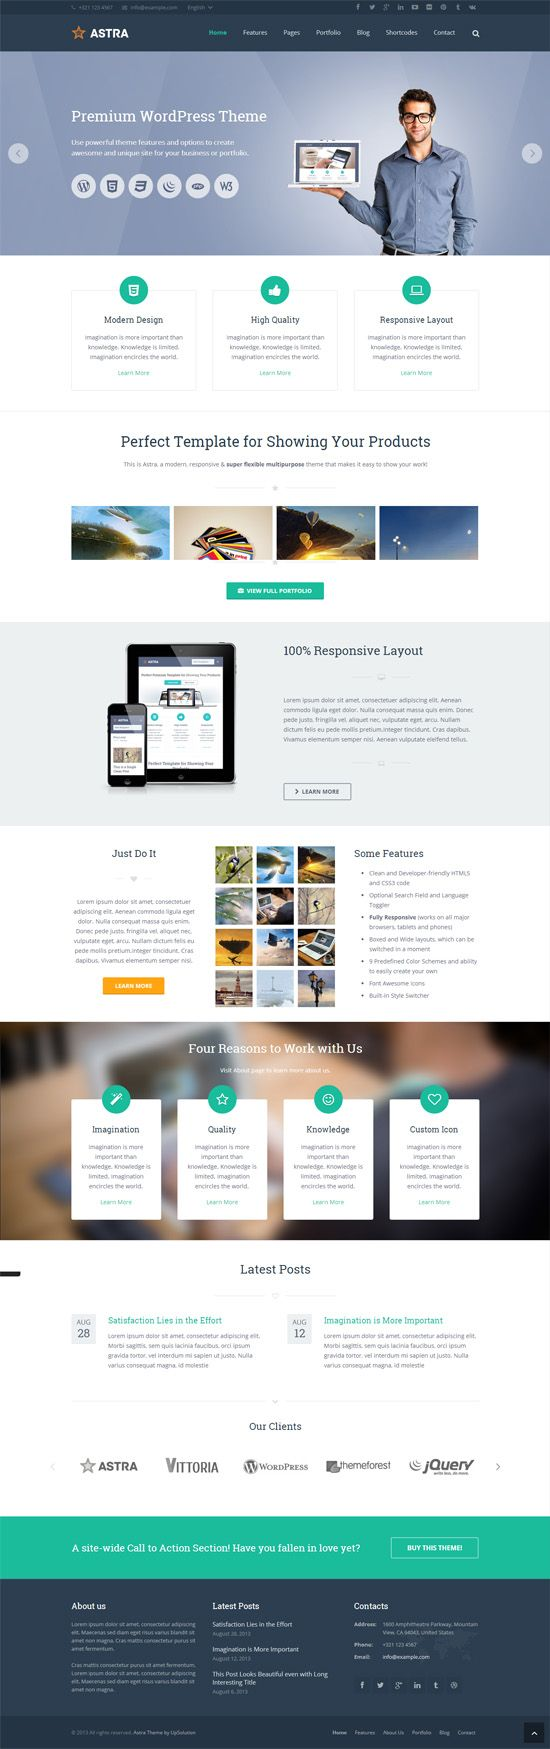 Astra - Retina Responsive WordPress Theme #wordpressthemes #responsivedesign #flatdesign